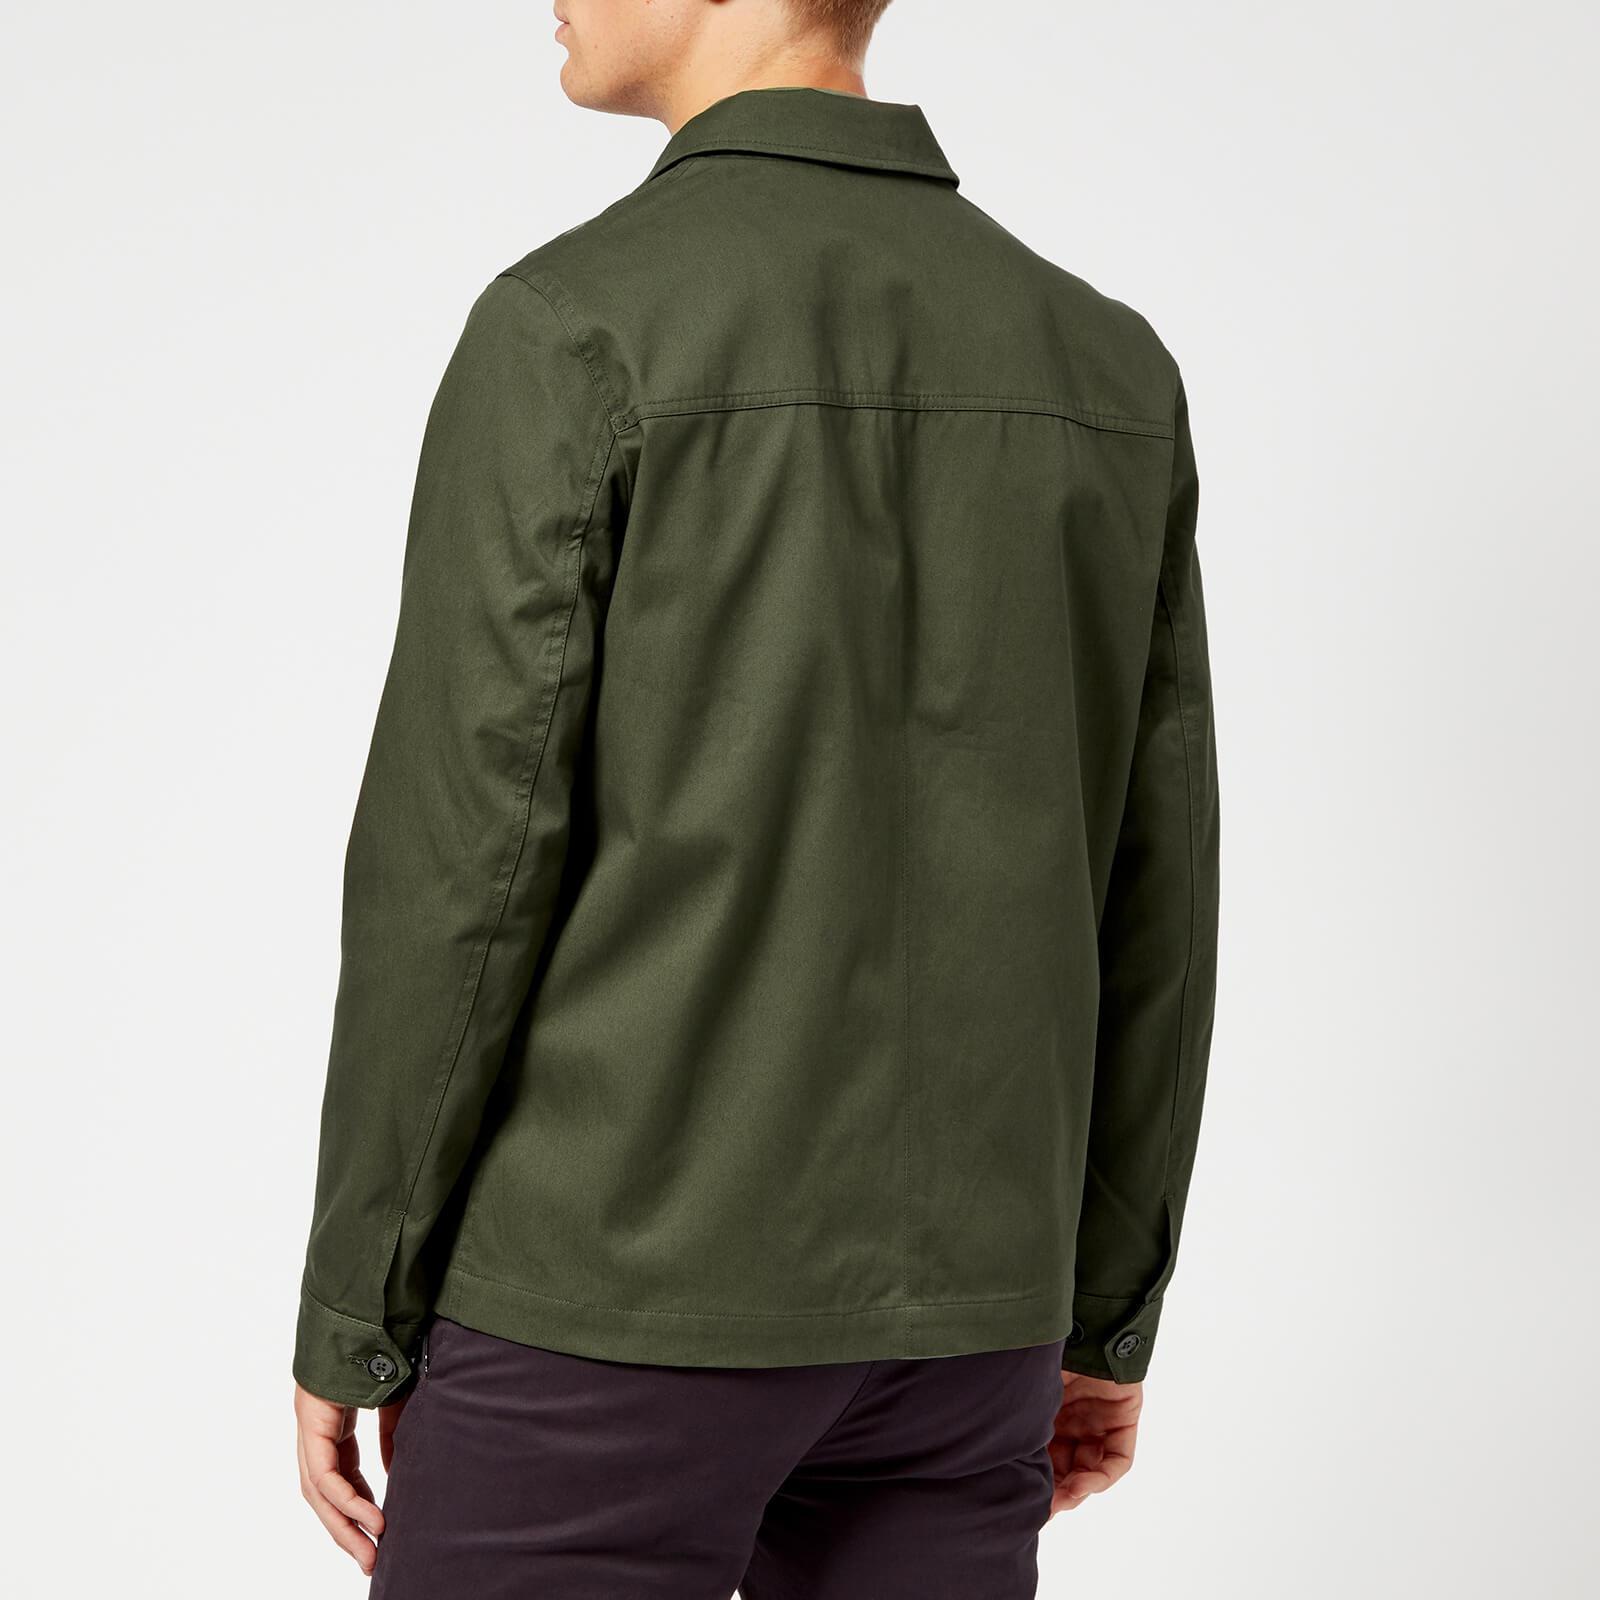 369060e21336dd Ted Baker - Green Grapes Workwear Jacket for Men - Lyst. View fullscreen